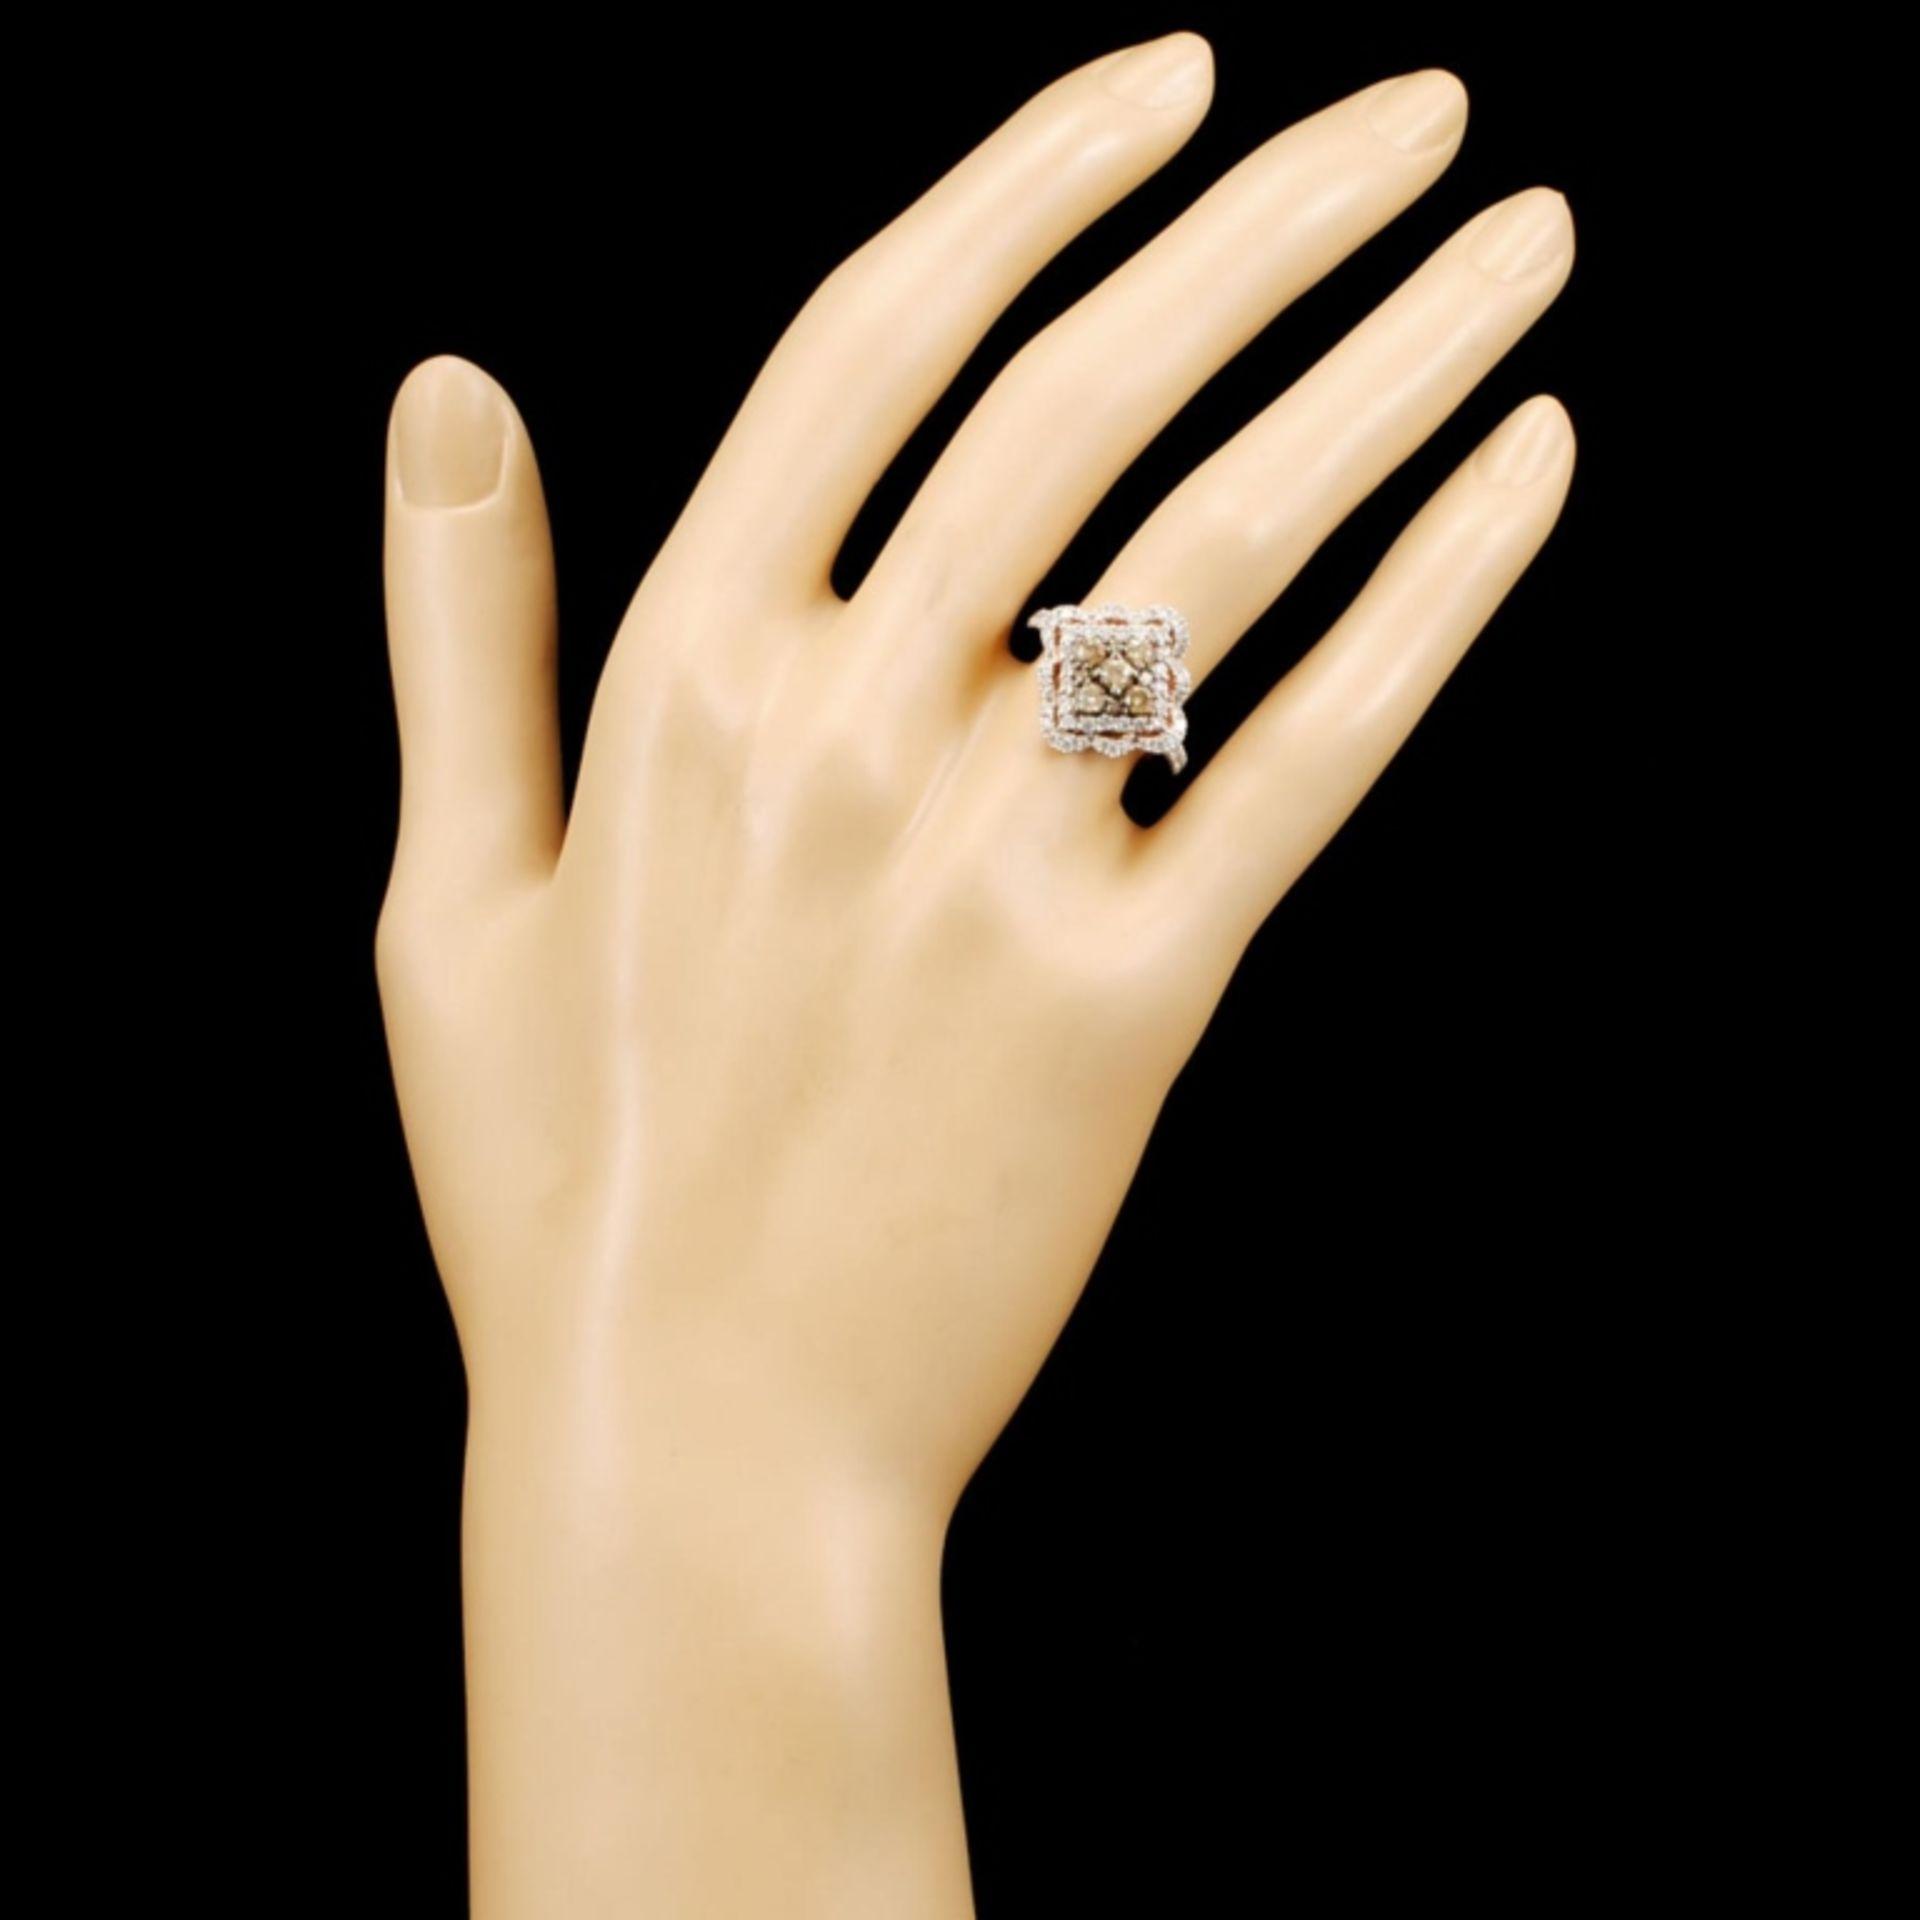 14K Gold 1.19ctw Diamond Ring - Image 4 of 5